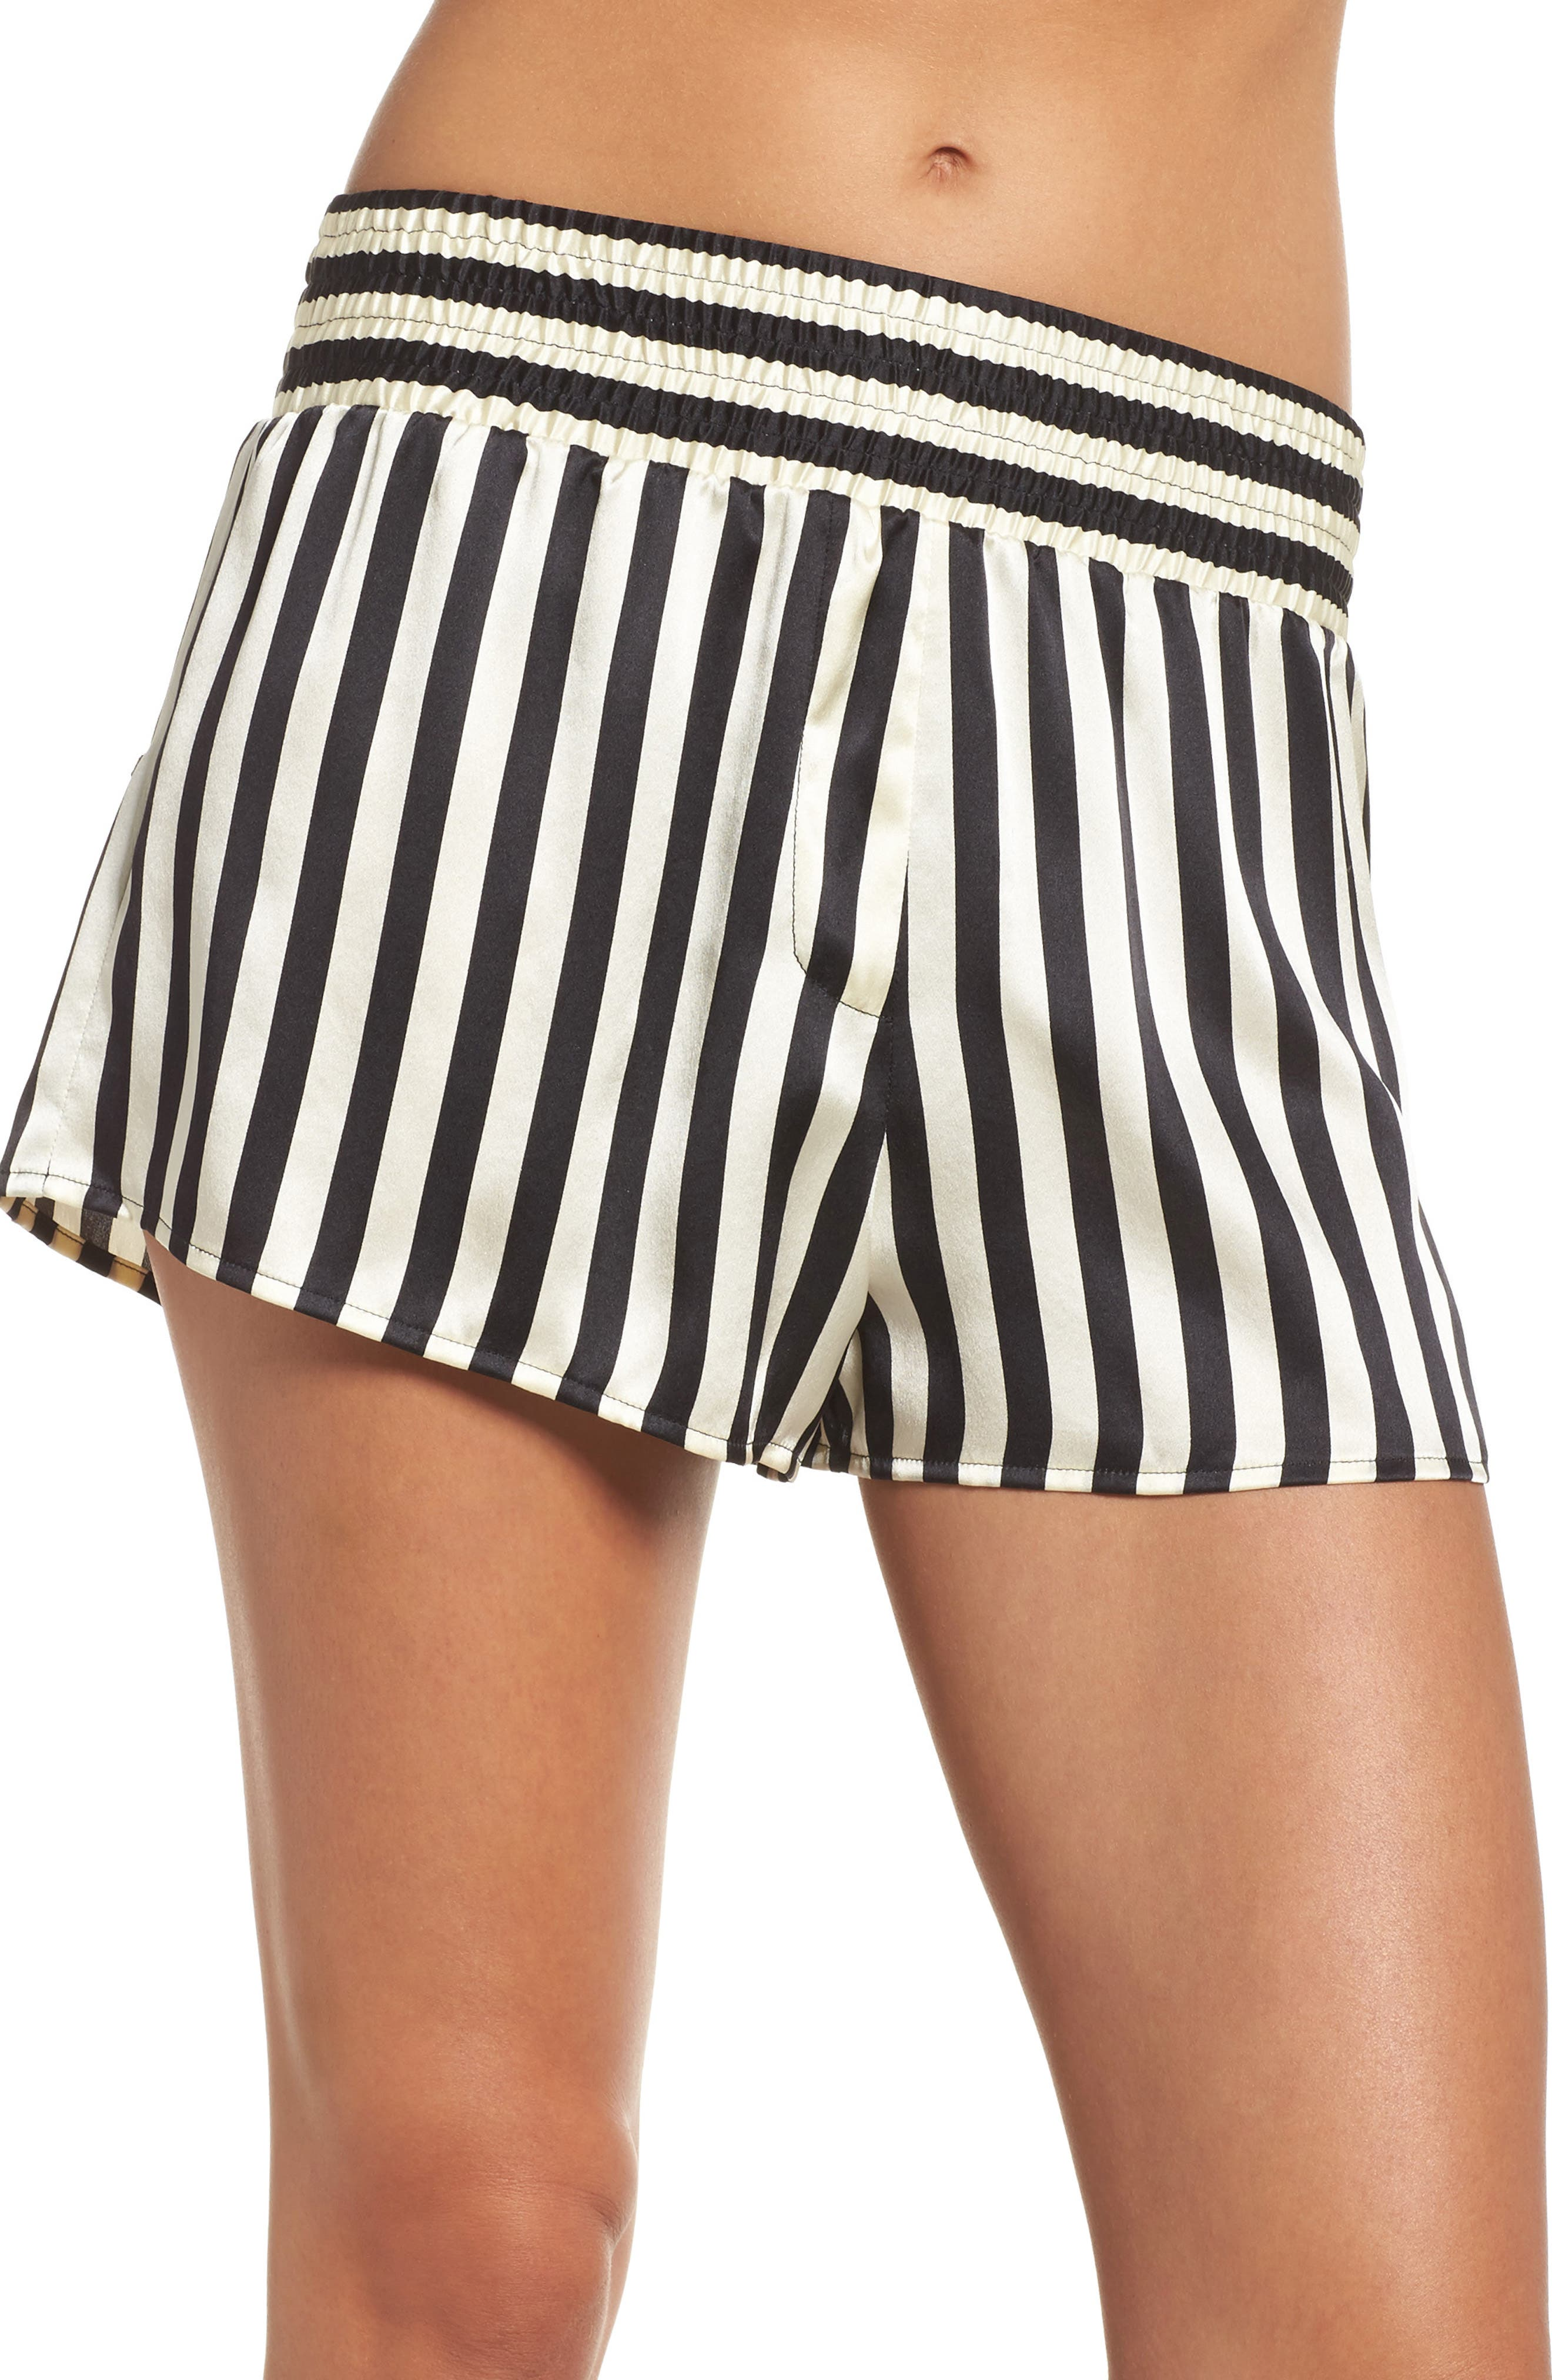 x Amanda Fatherazi Mini Mask Corey Stripe Silk Shorts,                             Main thumbnail 1, color,                             004